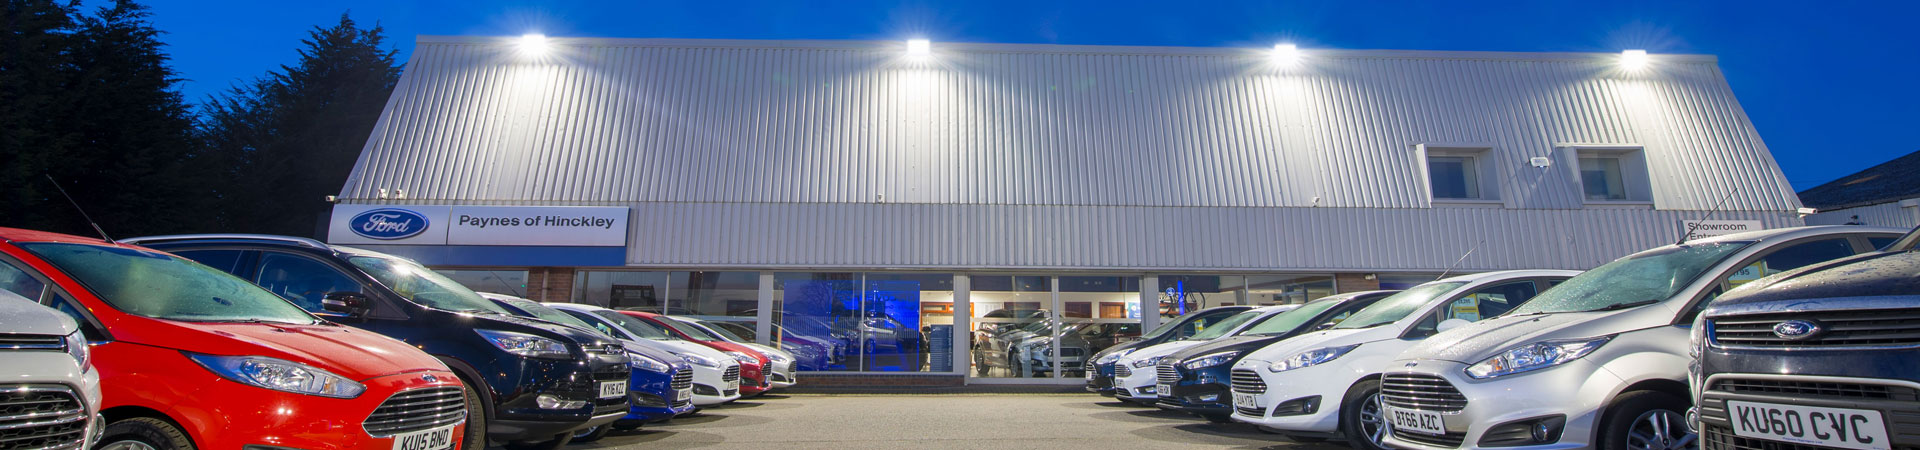 Paynes Ford Garage, Hinckley